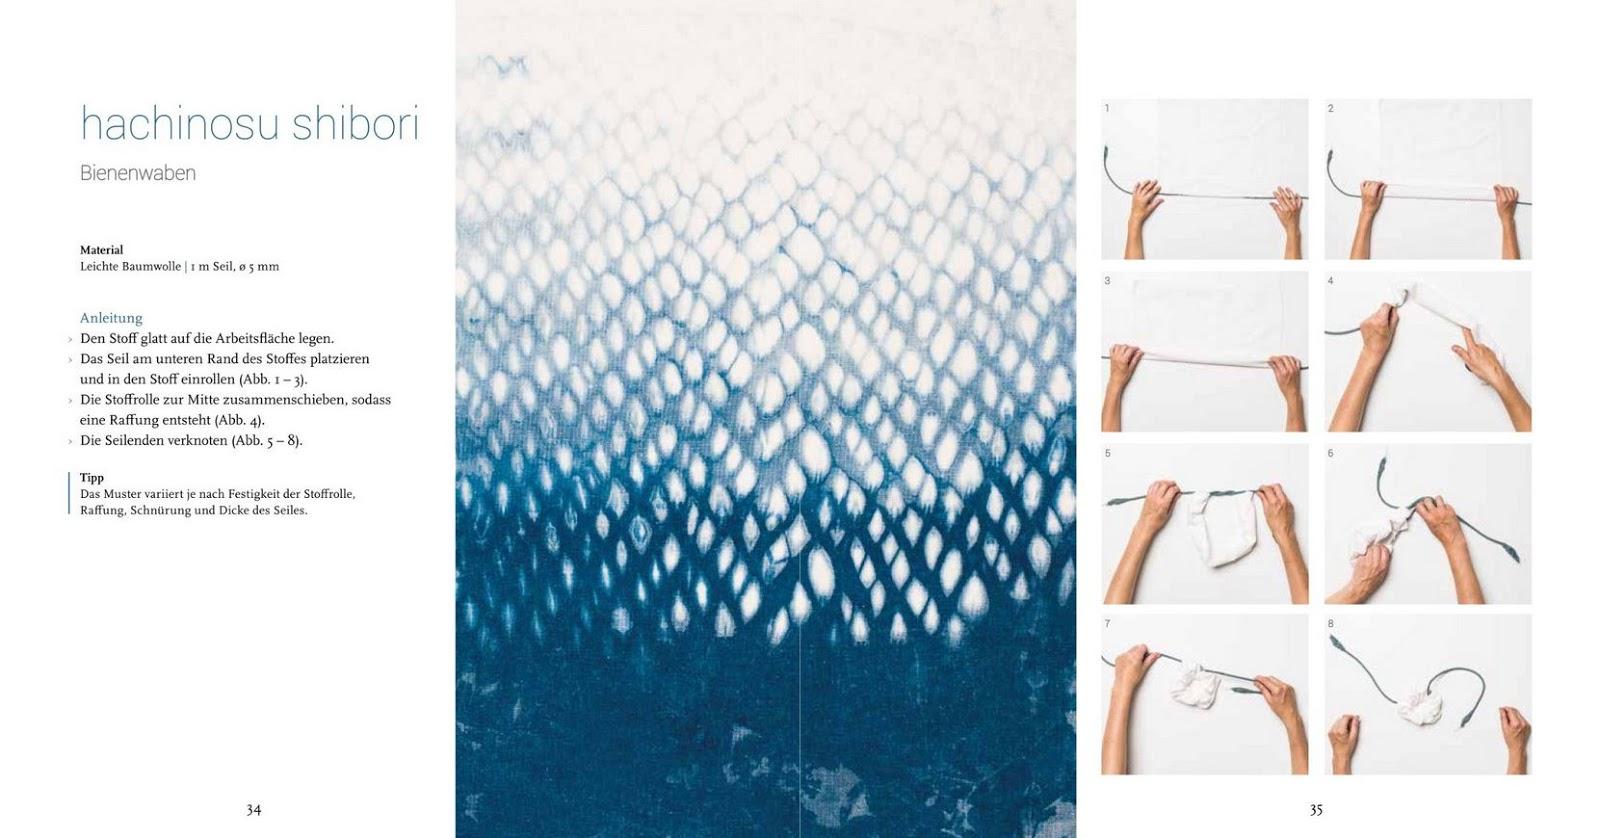 rezension: shibori. traditionelles färben neu interpretiert